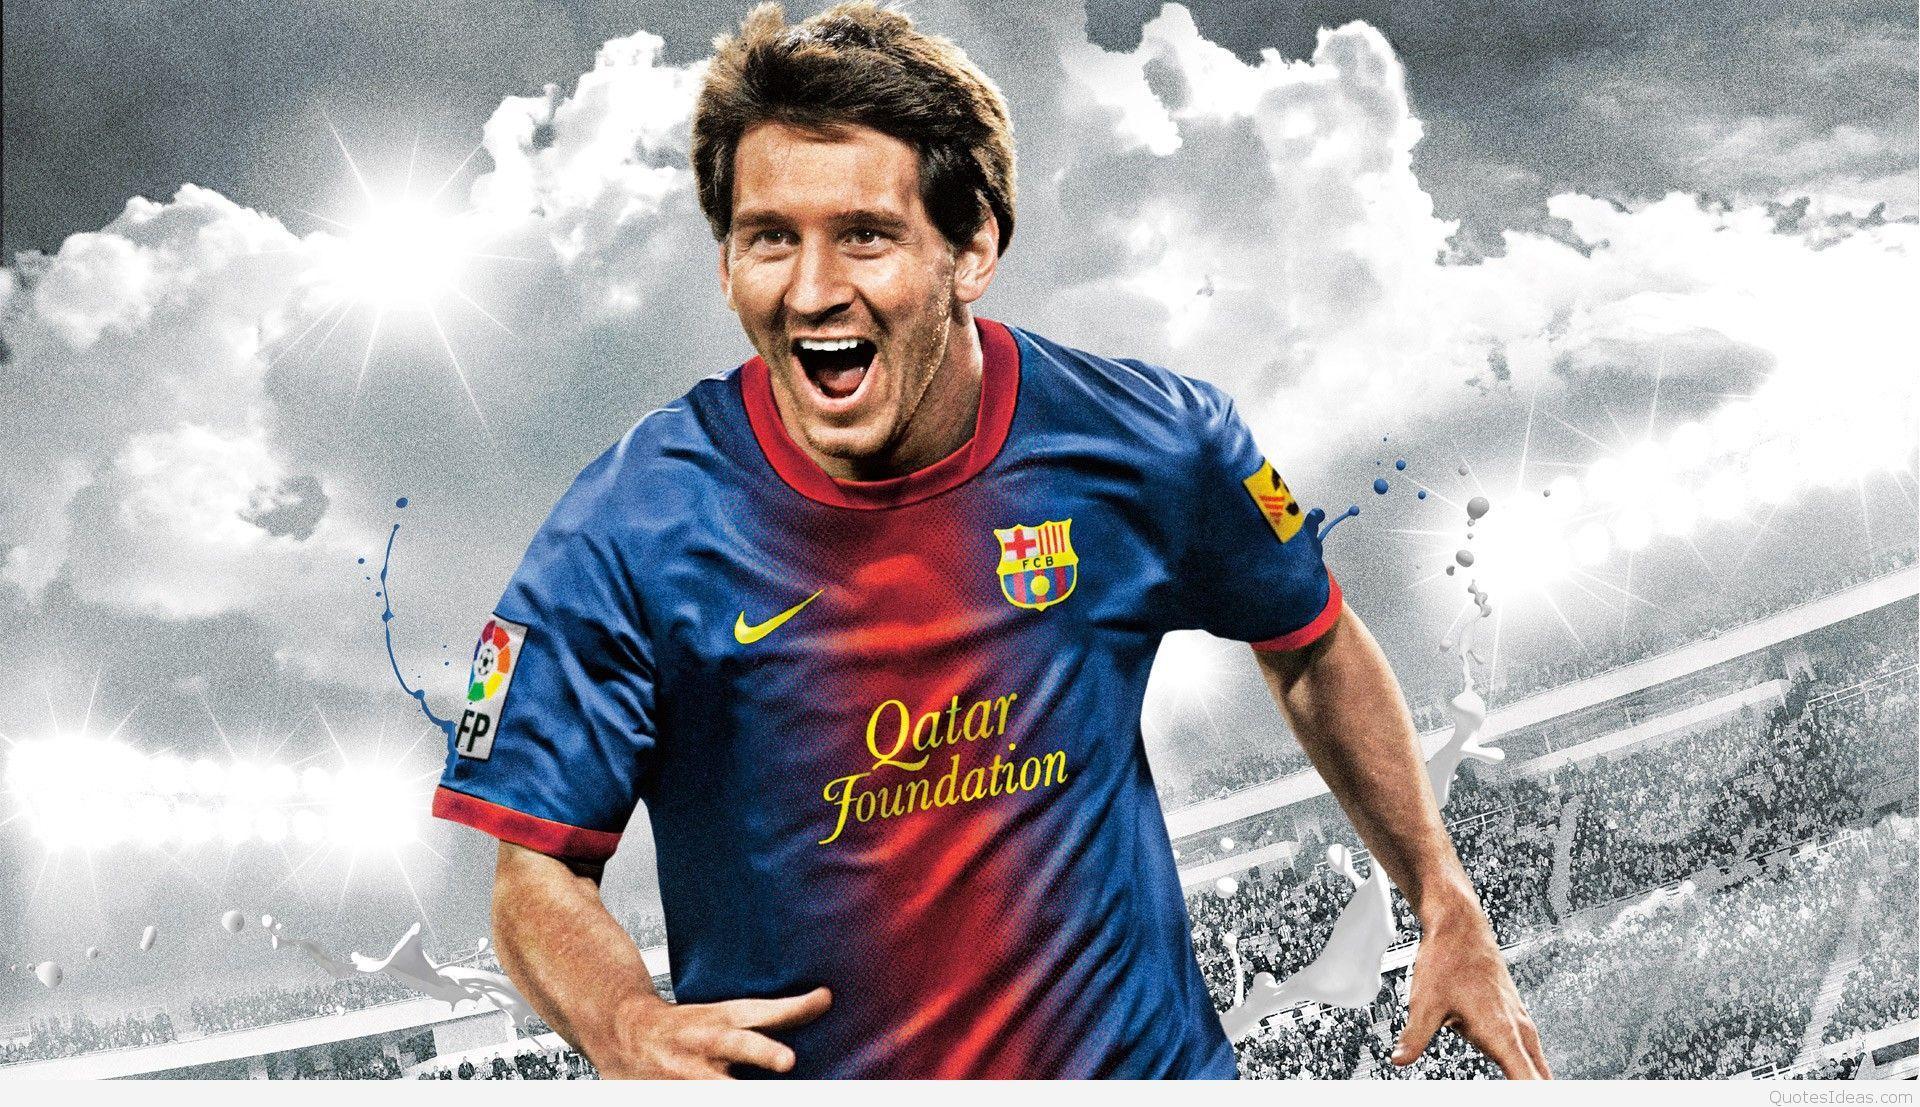 Messi Wallpaper Fifa Best Wallpaper Hd